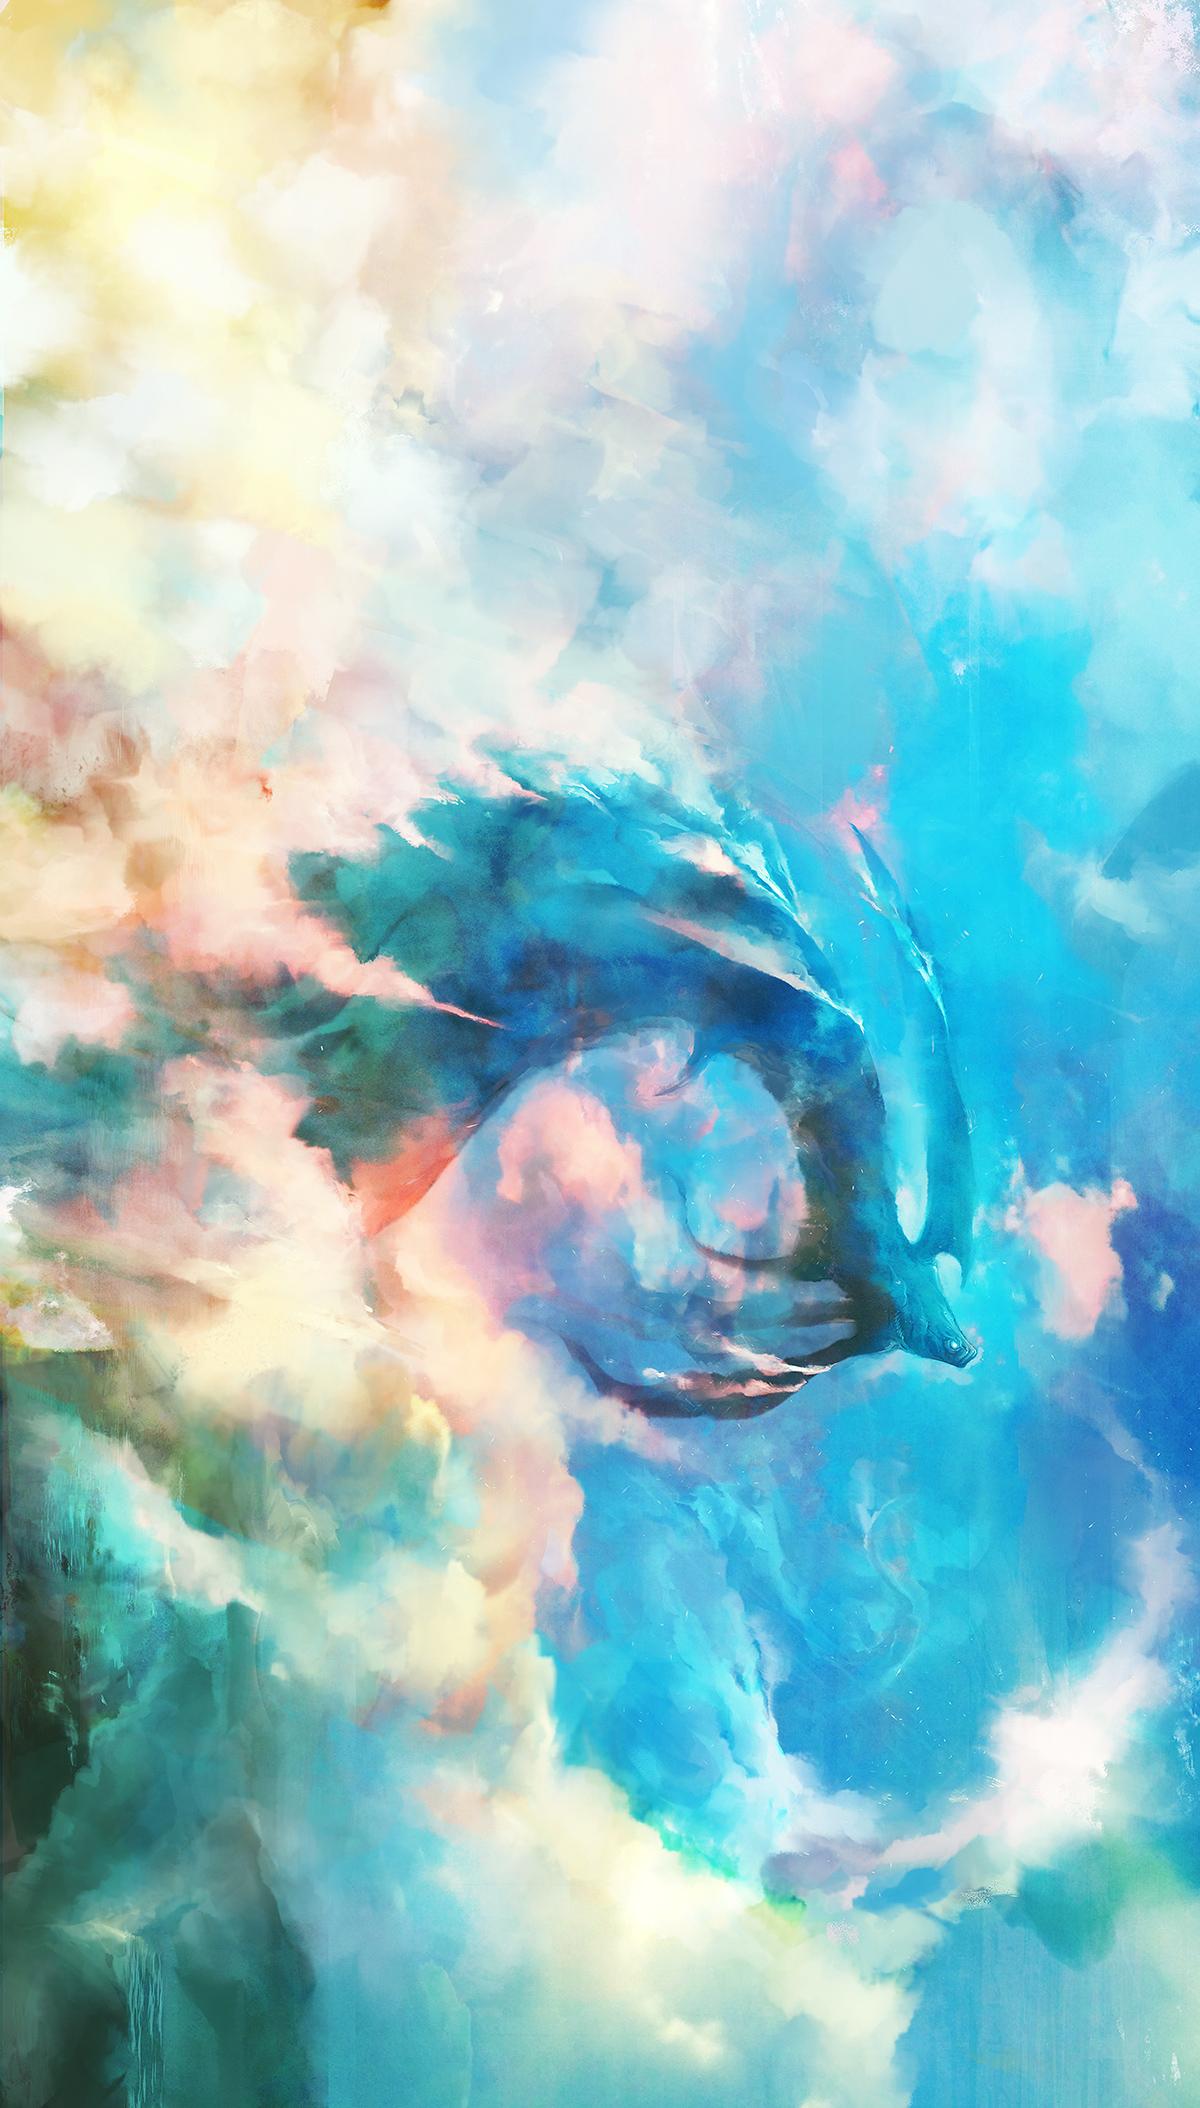 Storm King (alternate version) by cobaltplasma